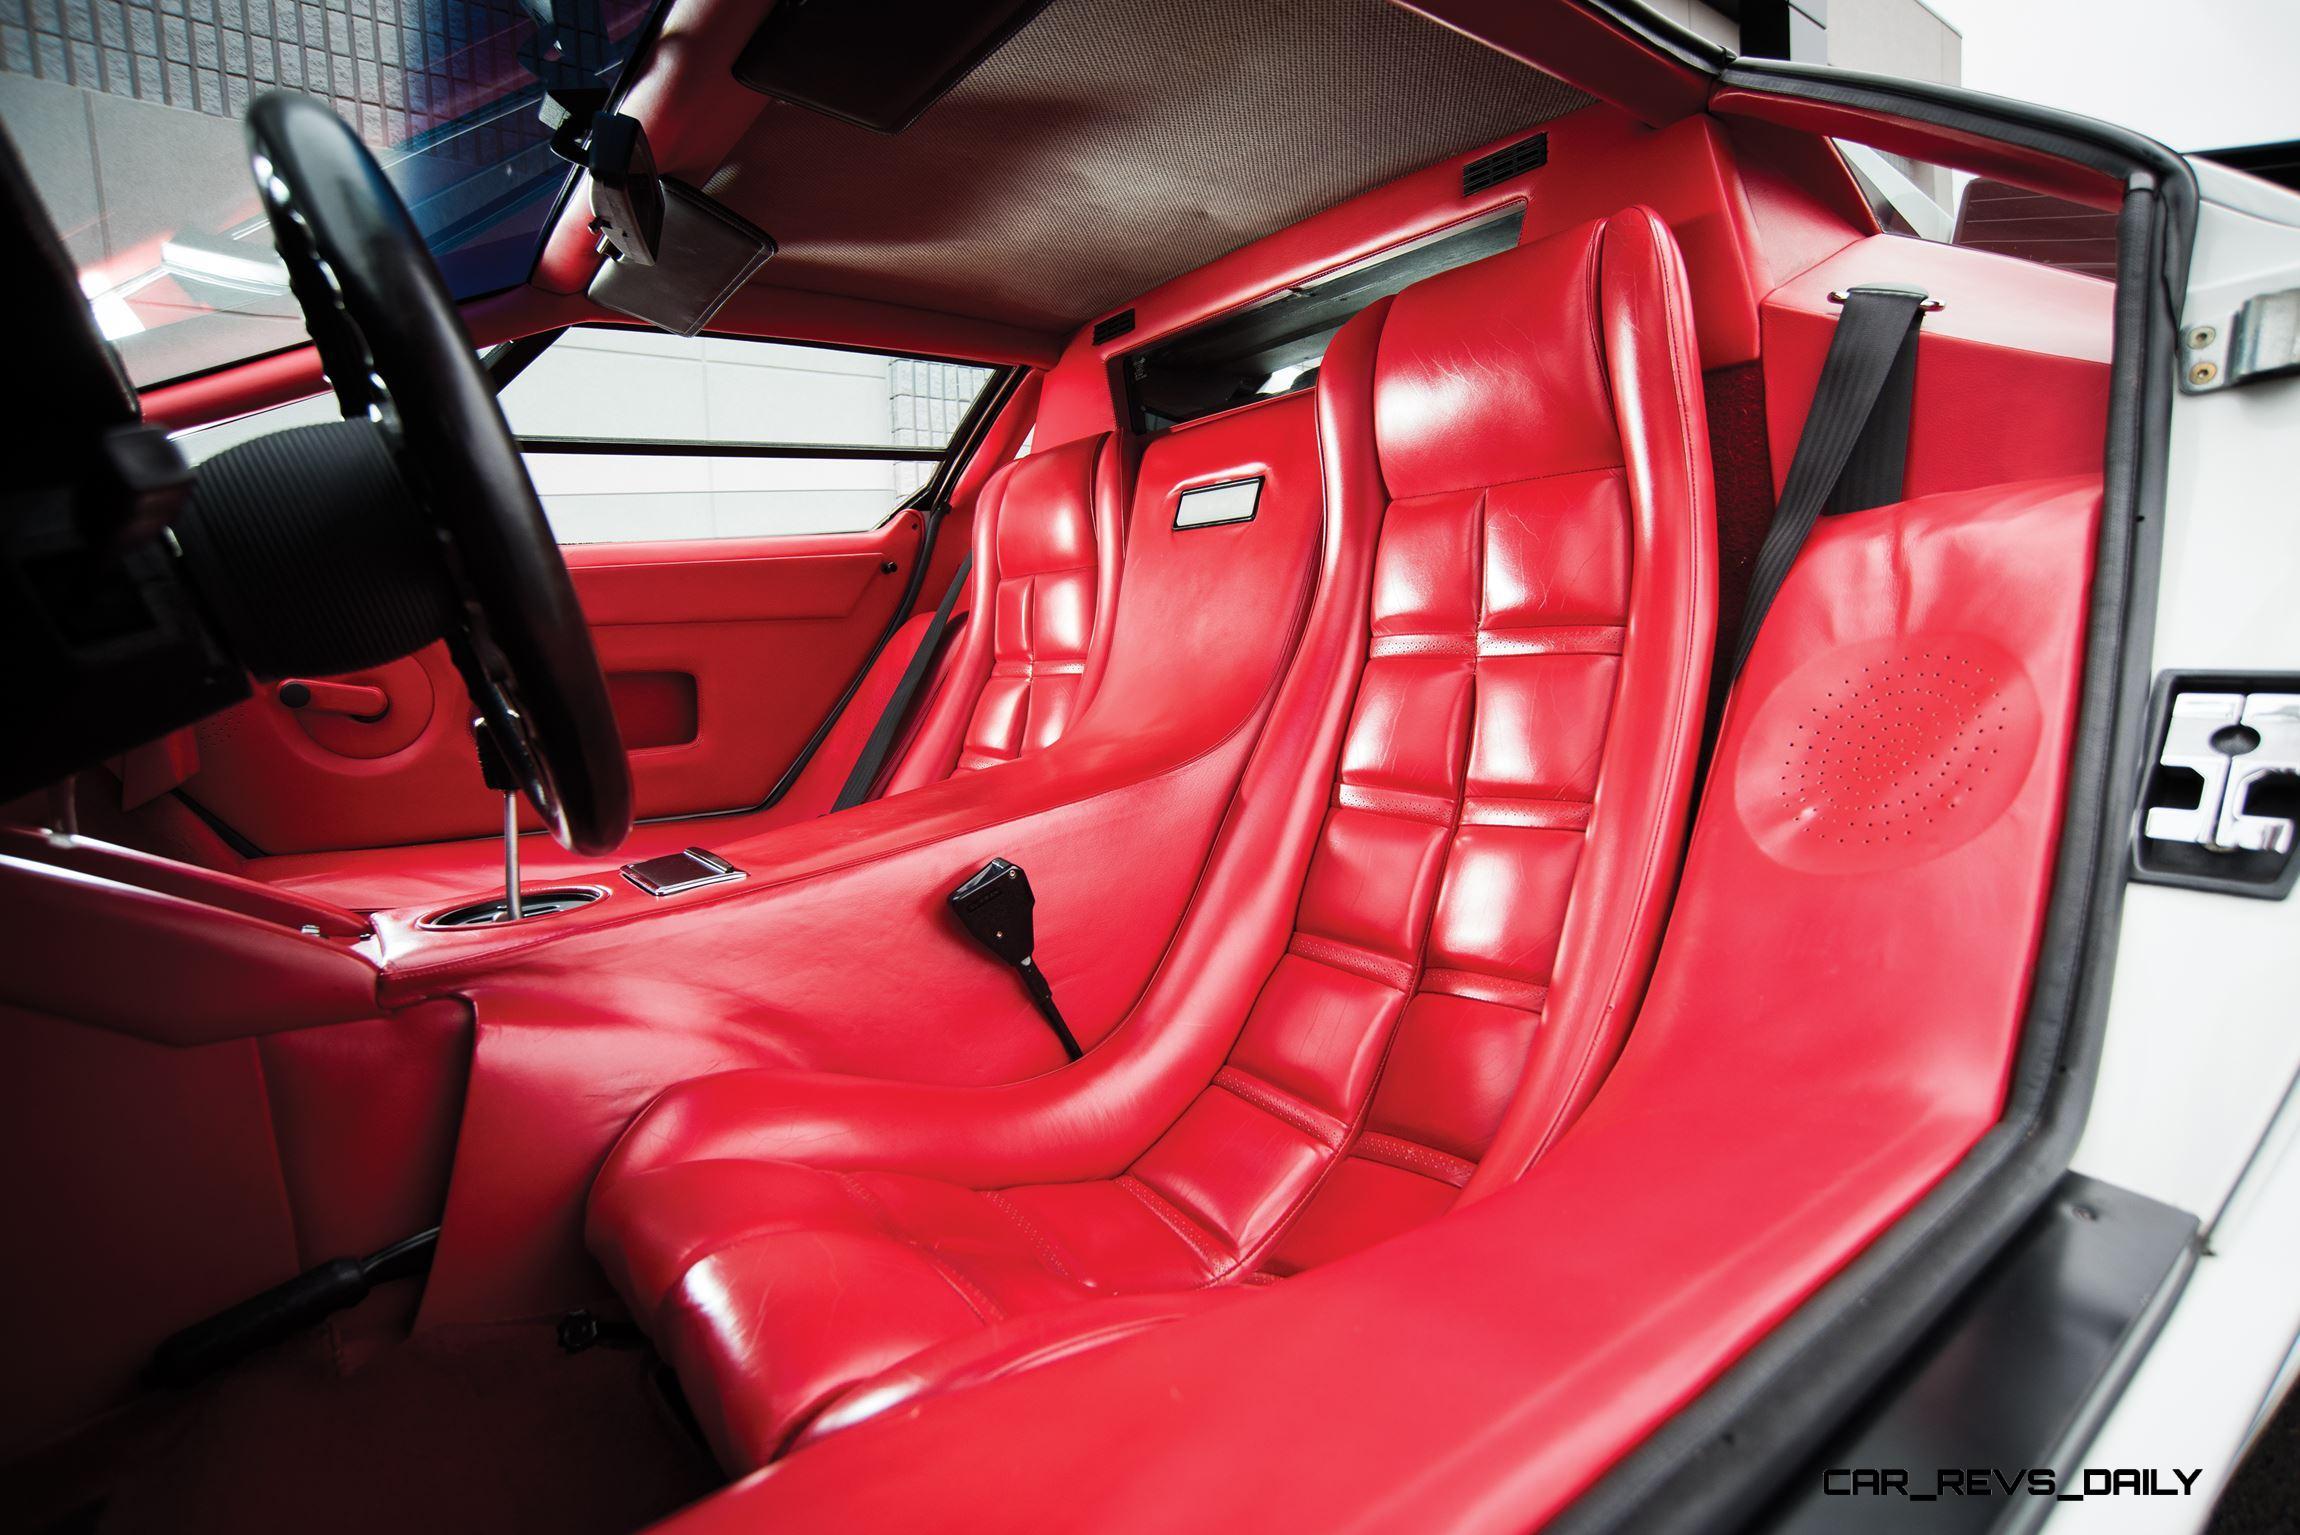 1988.5-Lamborghini-Countach-5000-QV-in-Bianco-White-27 Extraordinary Lamborghini Countach 5000 Quattrovalvole Specs Cars Trend